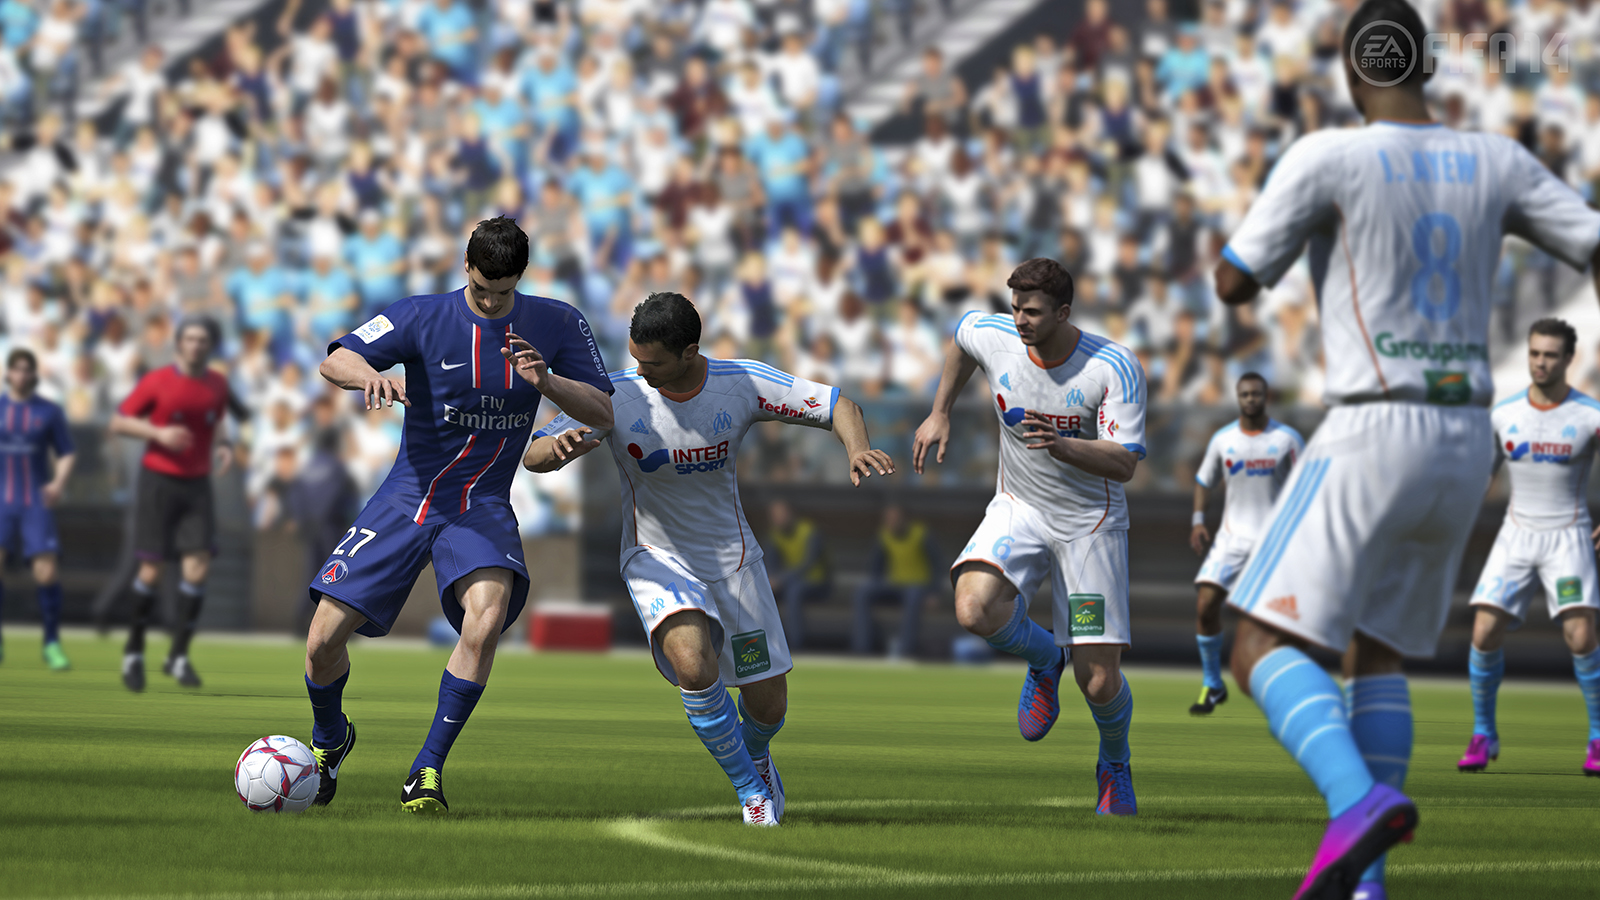 fifa14_gen3_fr_protect_the_ball_wm